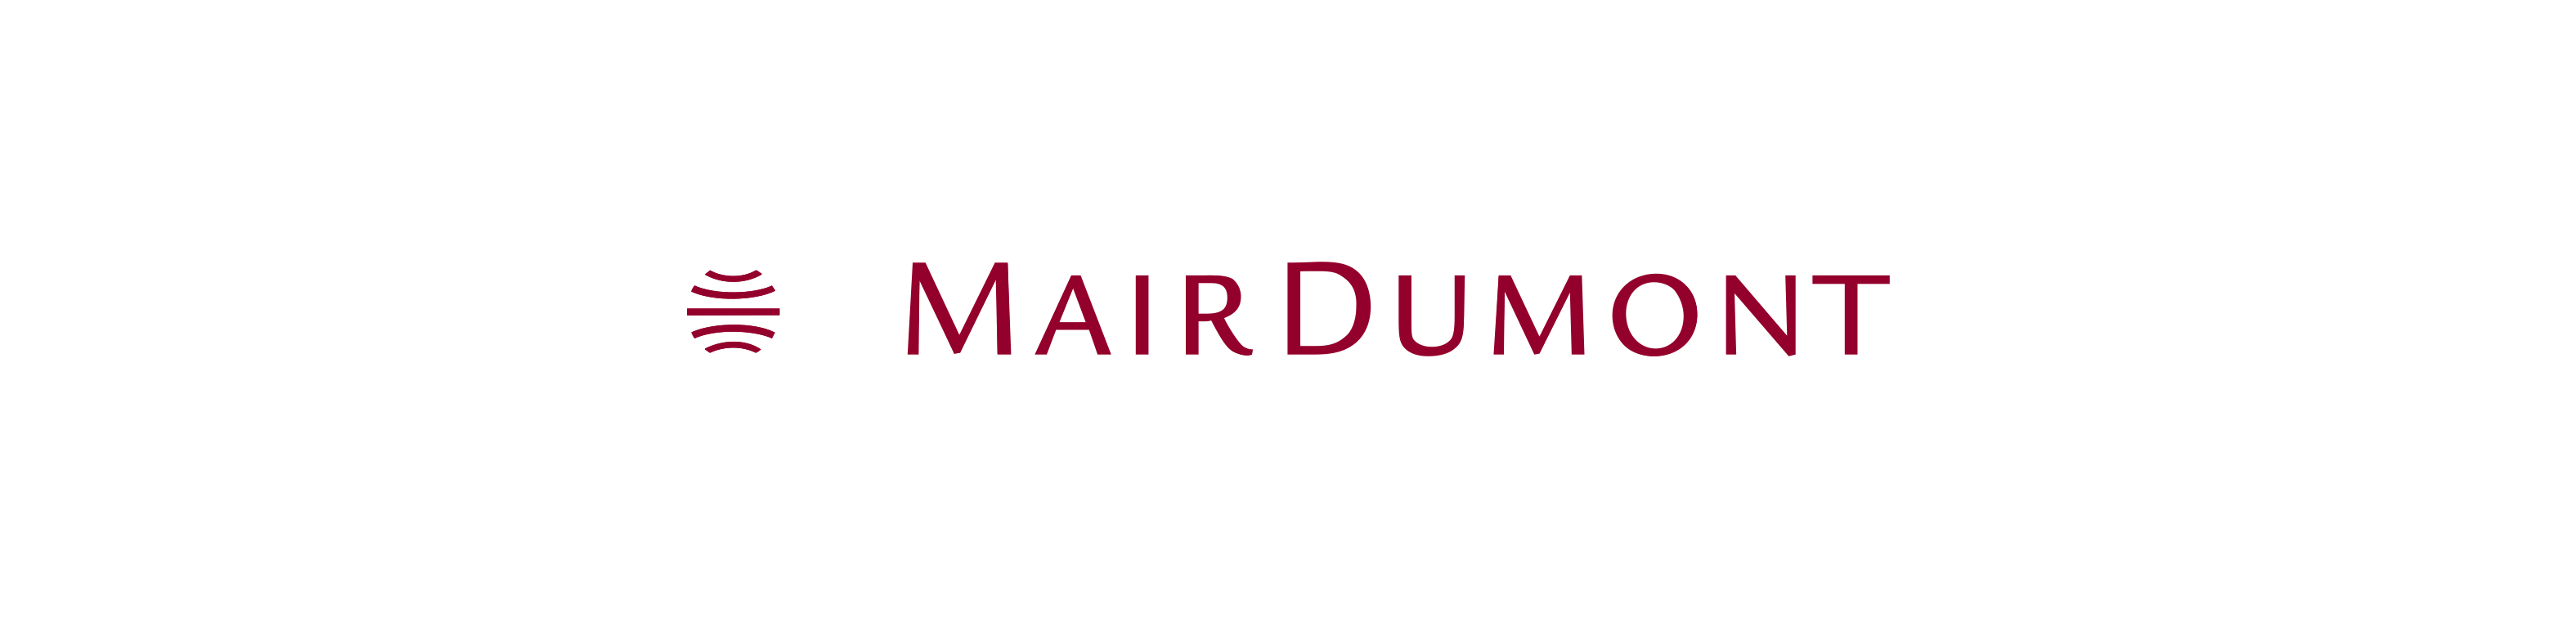 Mairdumont - Case Study